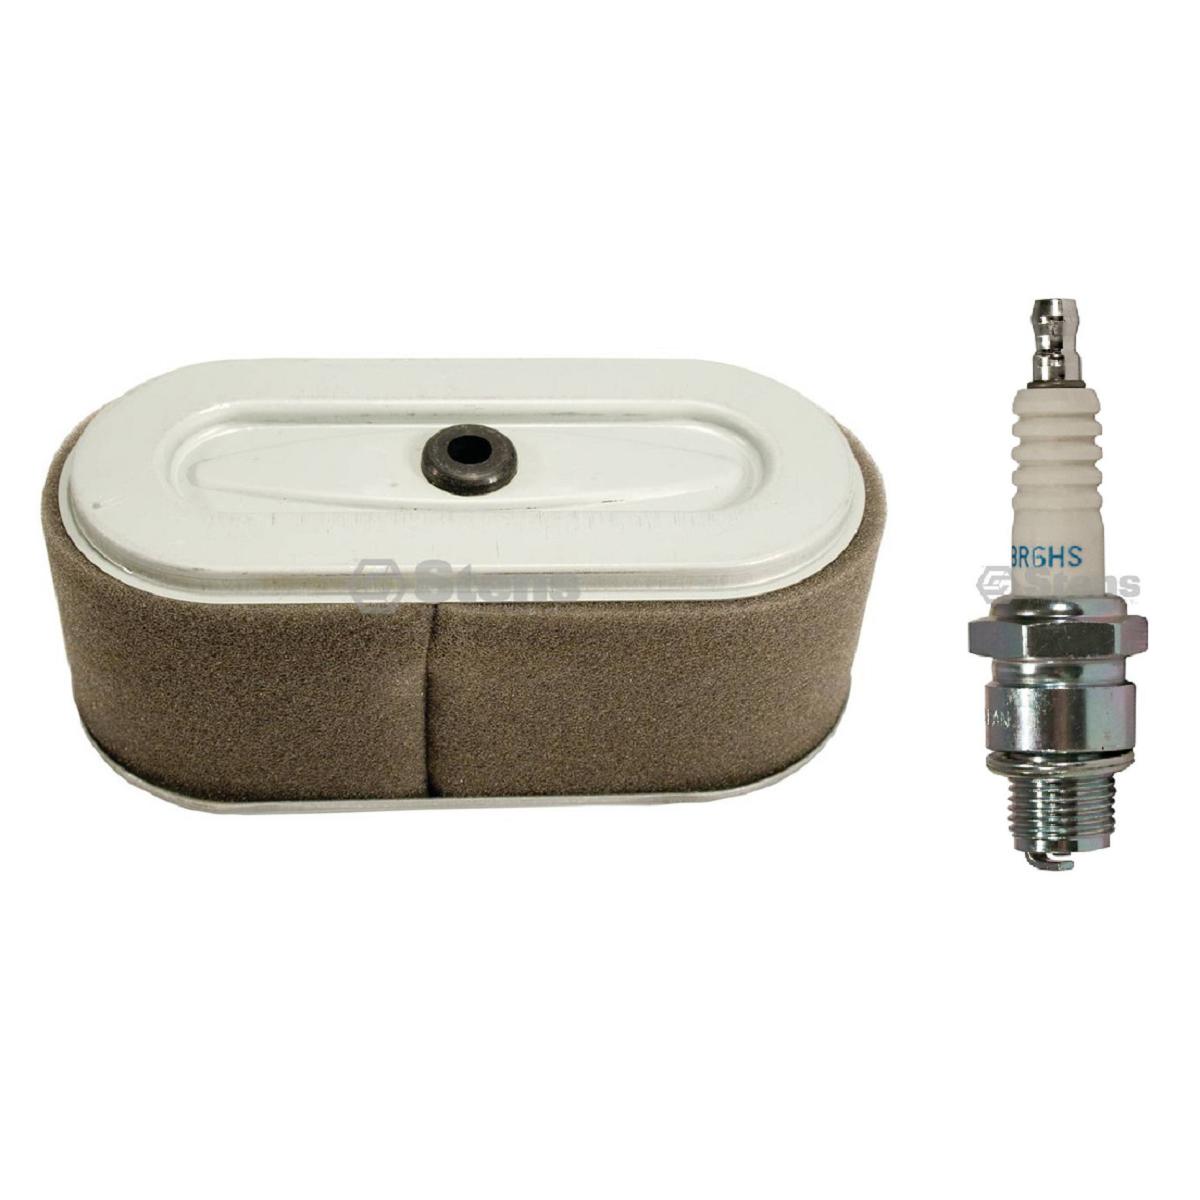 Air Filter & NGK Spark Plug Combo For Subaru Robin EX13 EX17 EX21 SP170 SP210 - $19.16